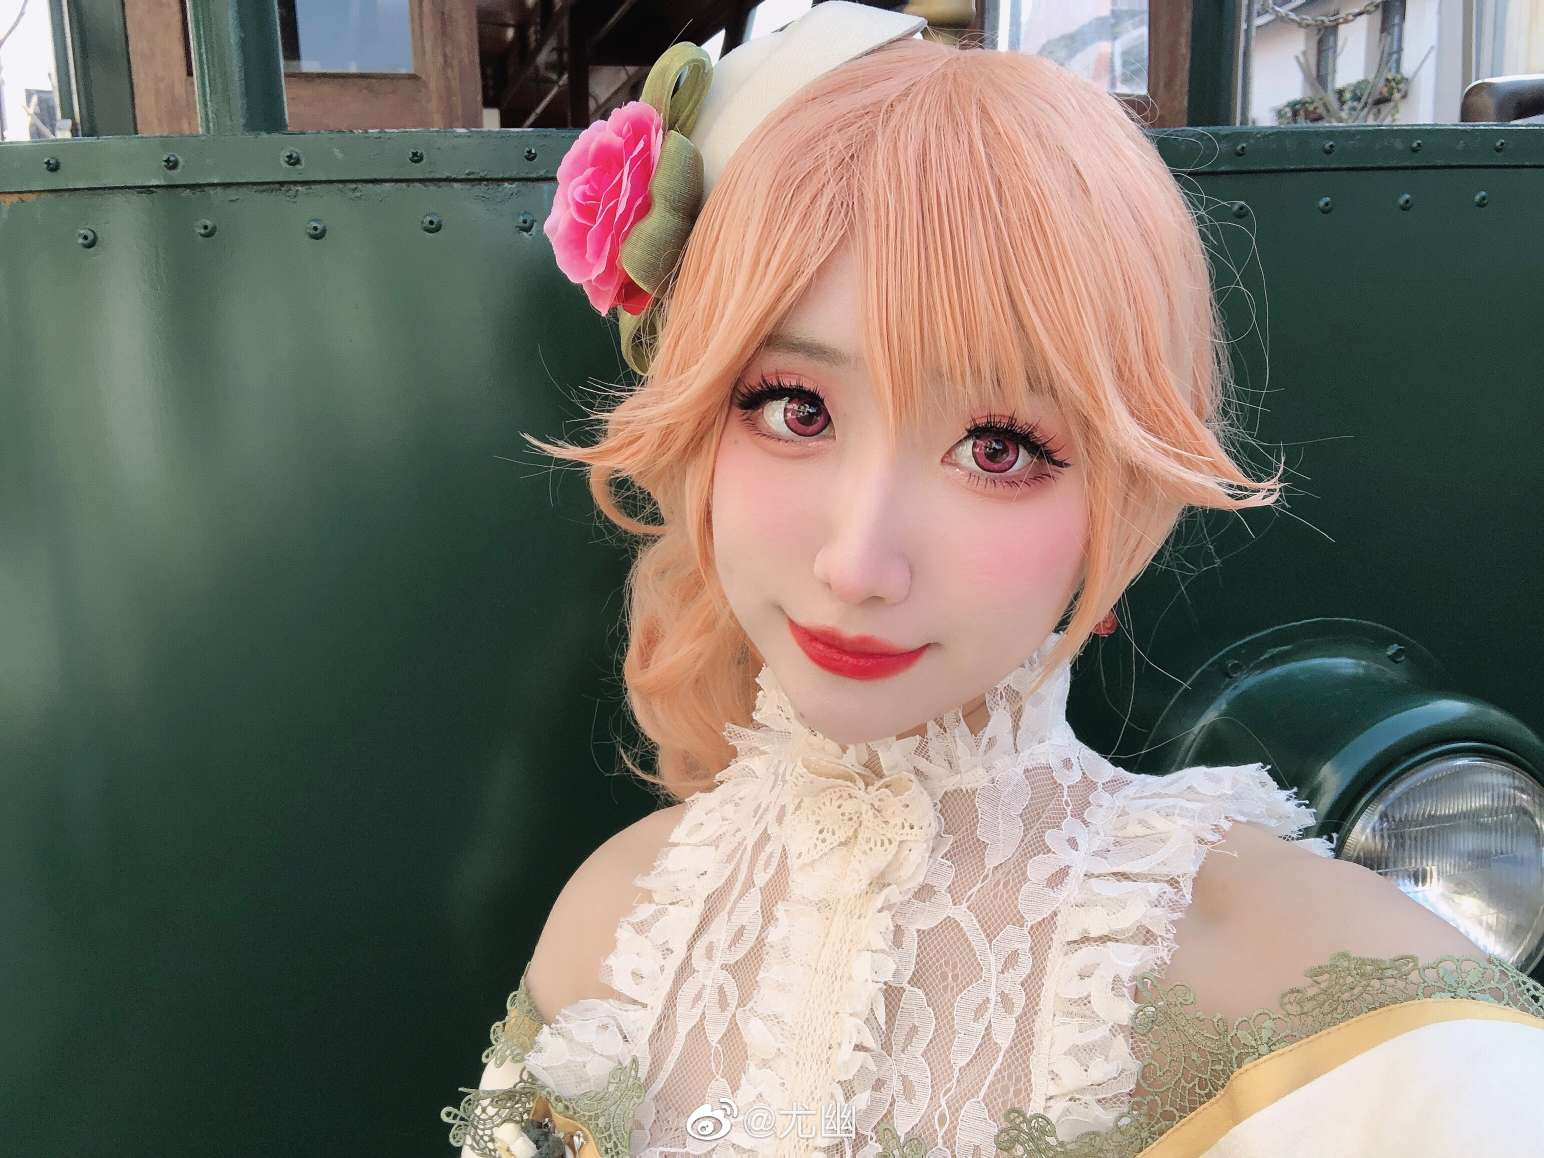 【COS】黎塞留换装「常緑Rêve prophétique」参上-小柚妹站